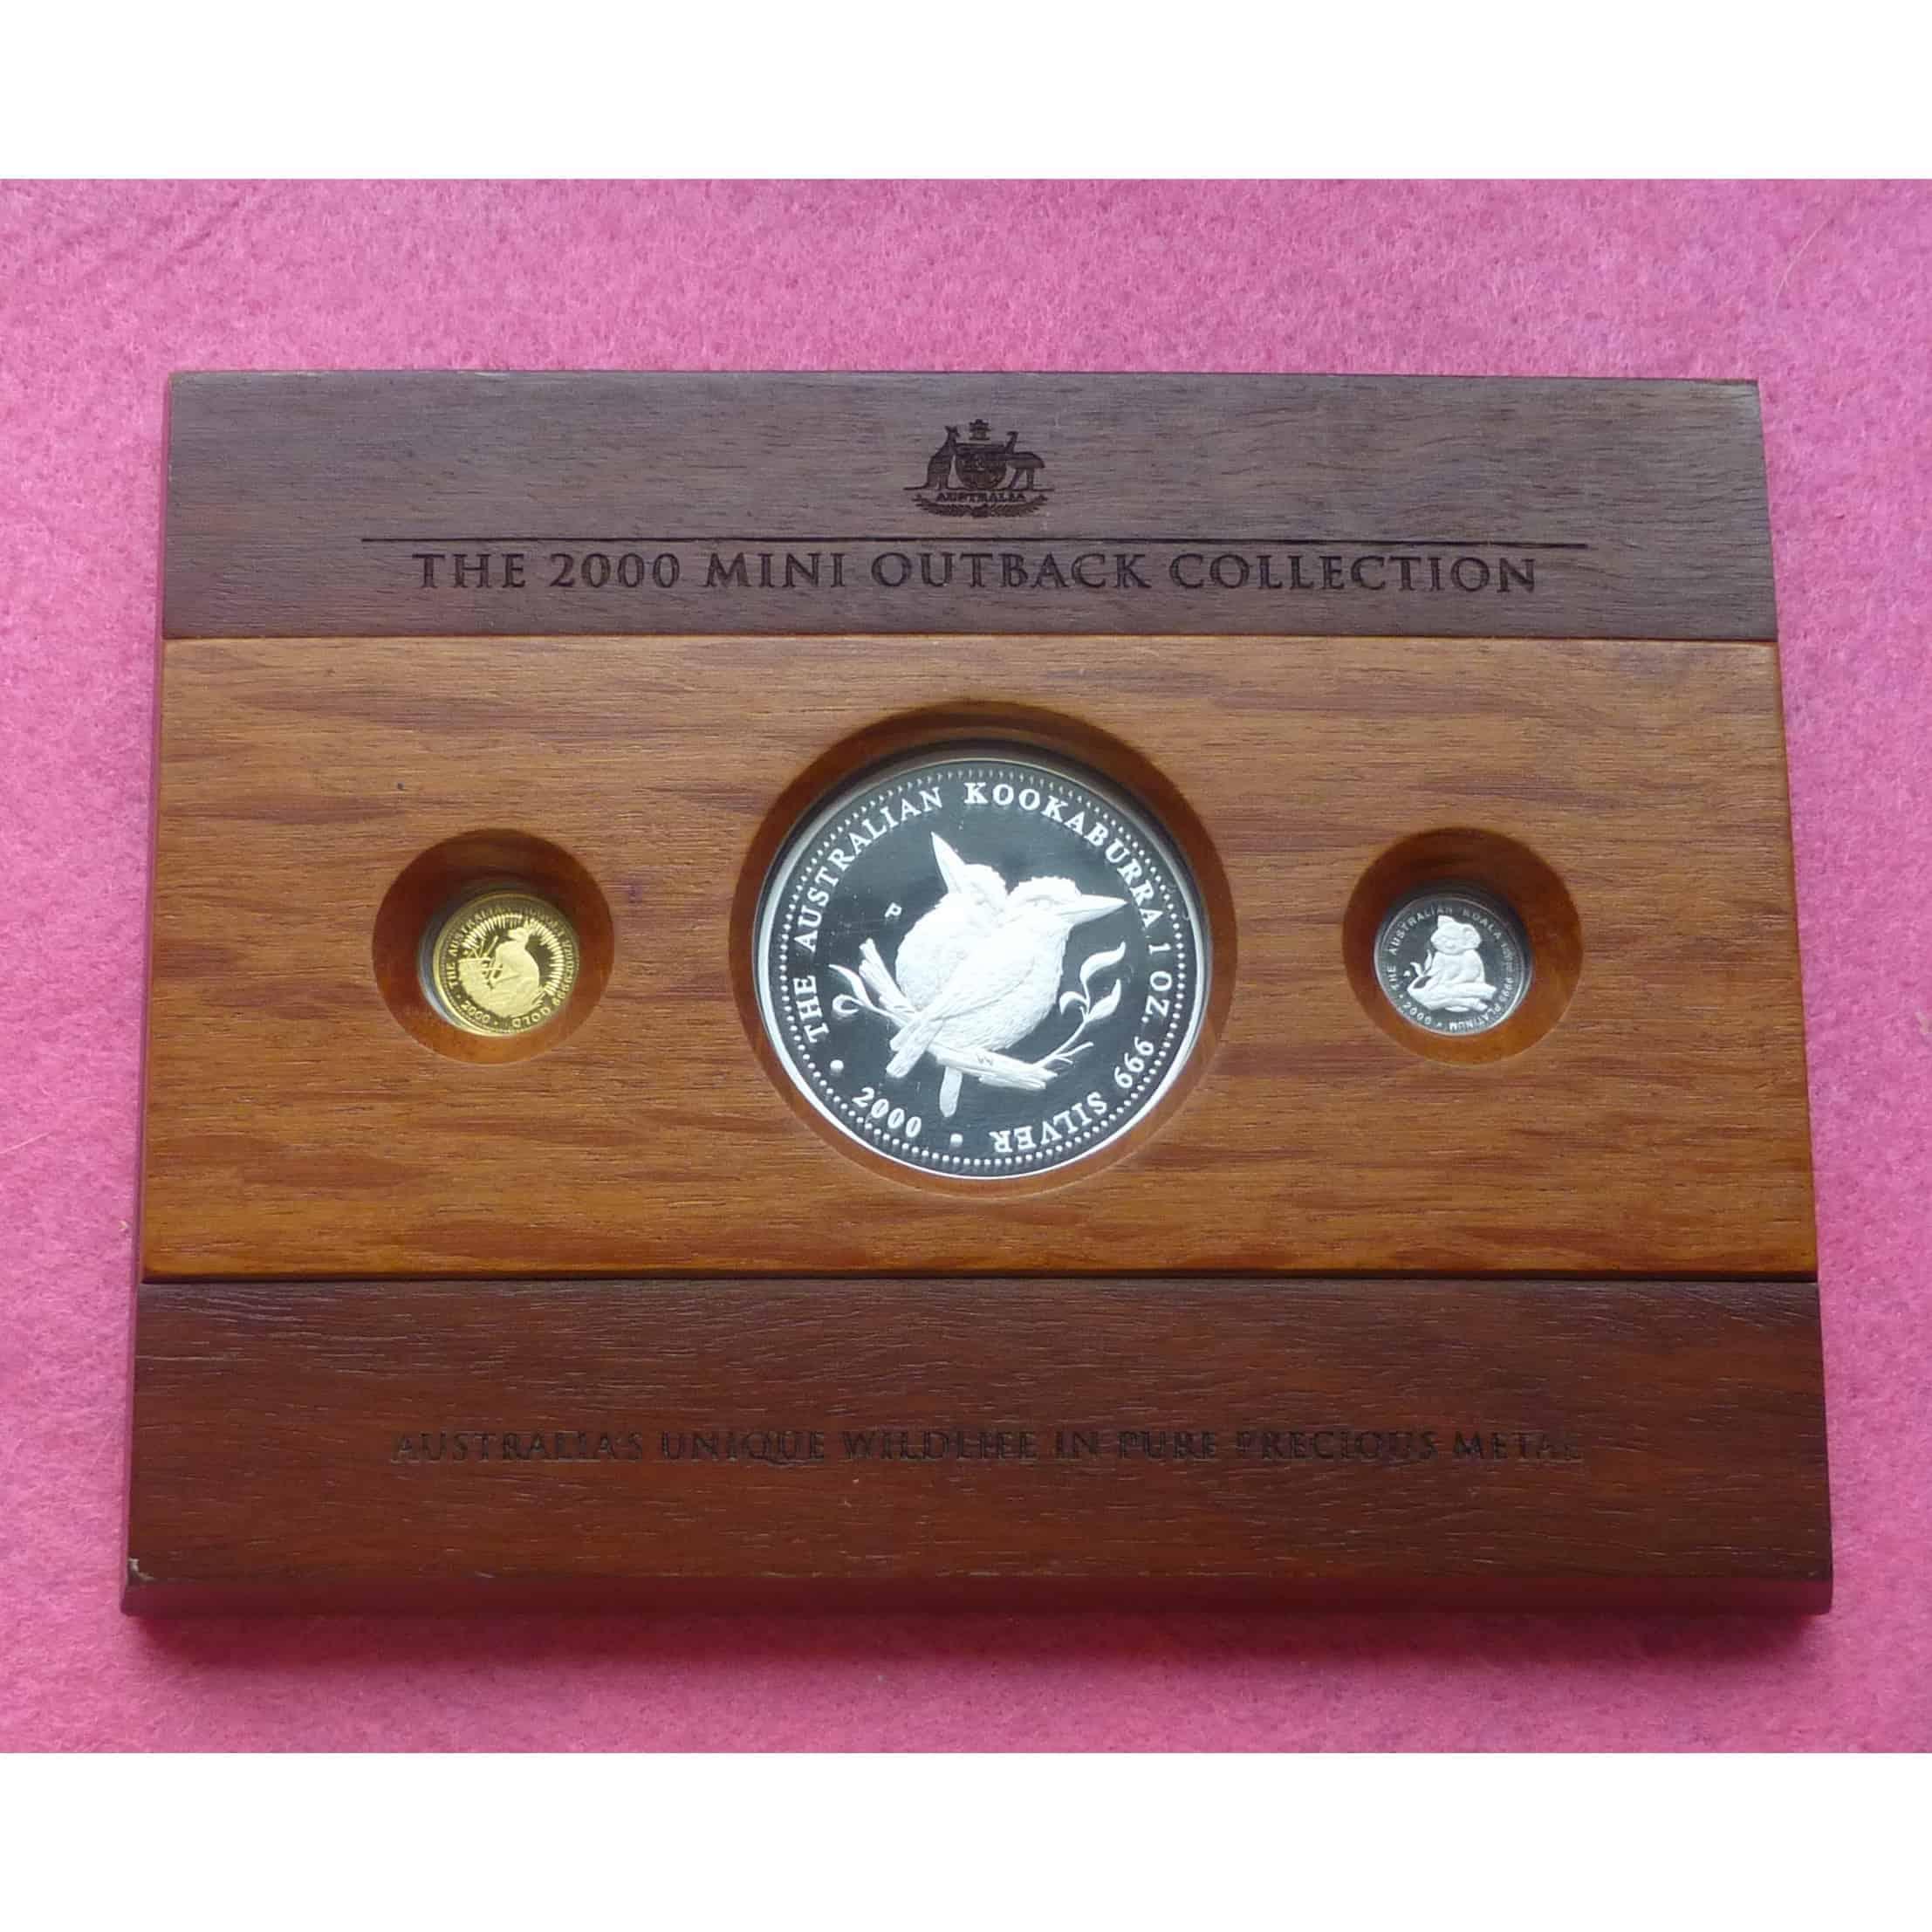 Gold Australian Platinum: 2000 AUSTRALIA MINI OUTBACK COIN COLLECTION